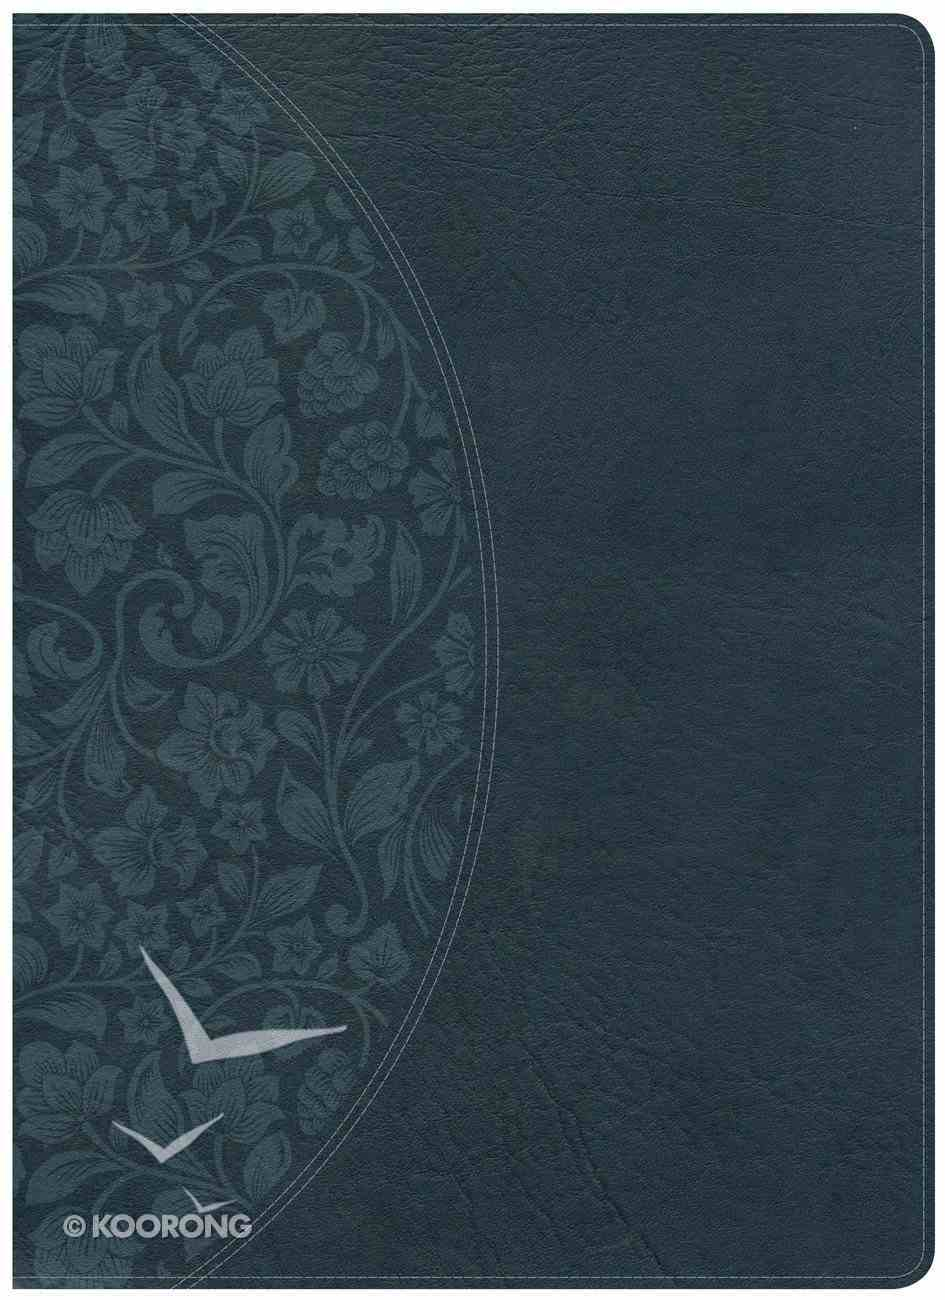 NKJV Large Print Holman Study Bible Dark Teal Imitation Leather